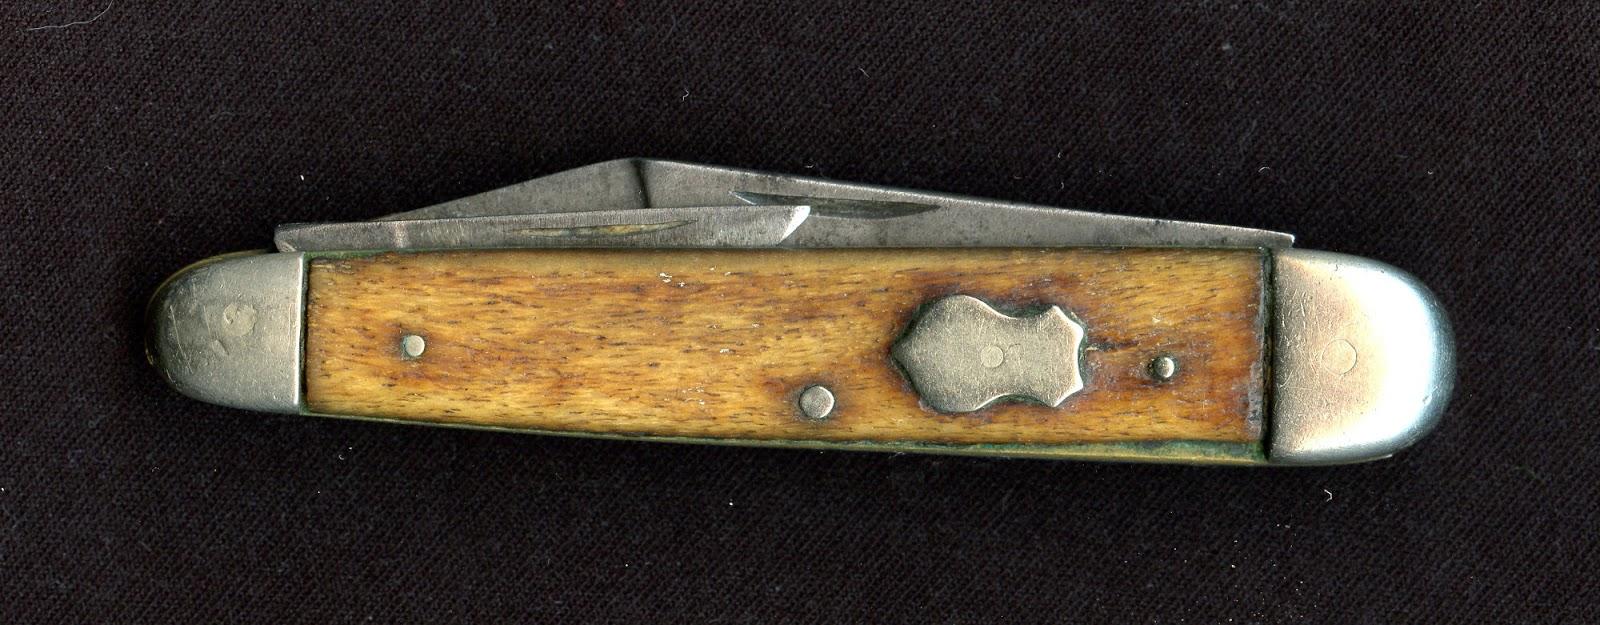 Knife Forge